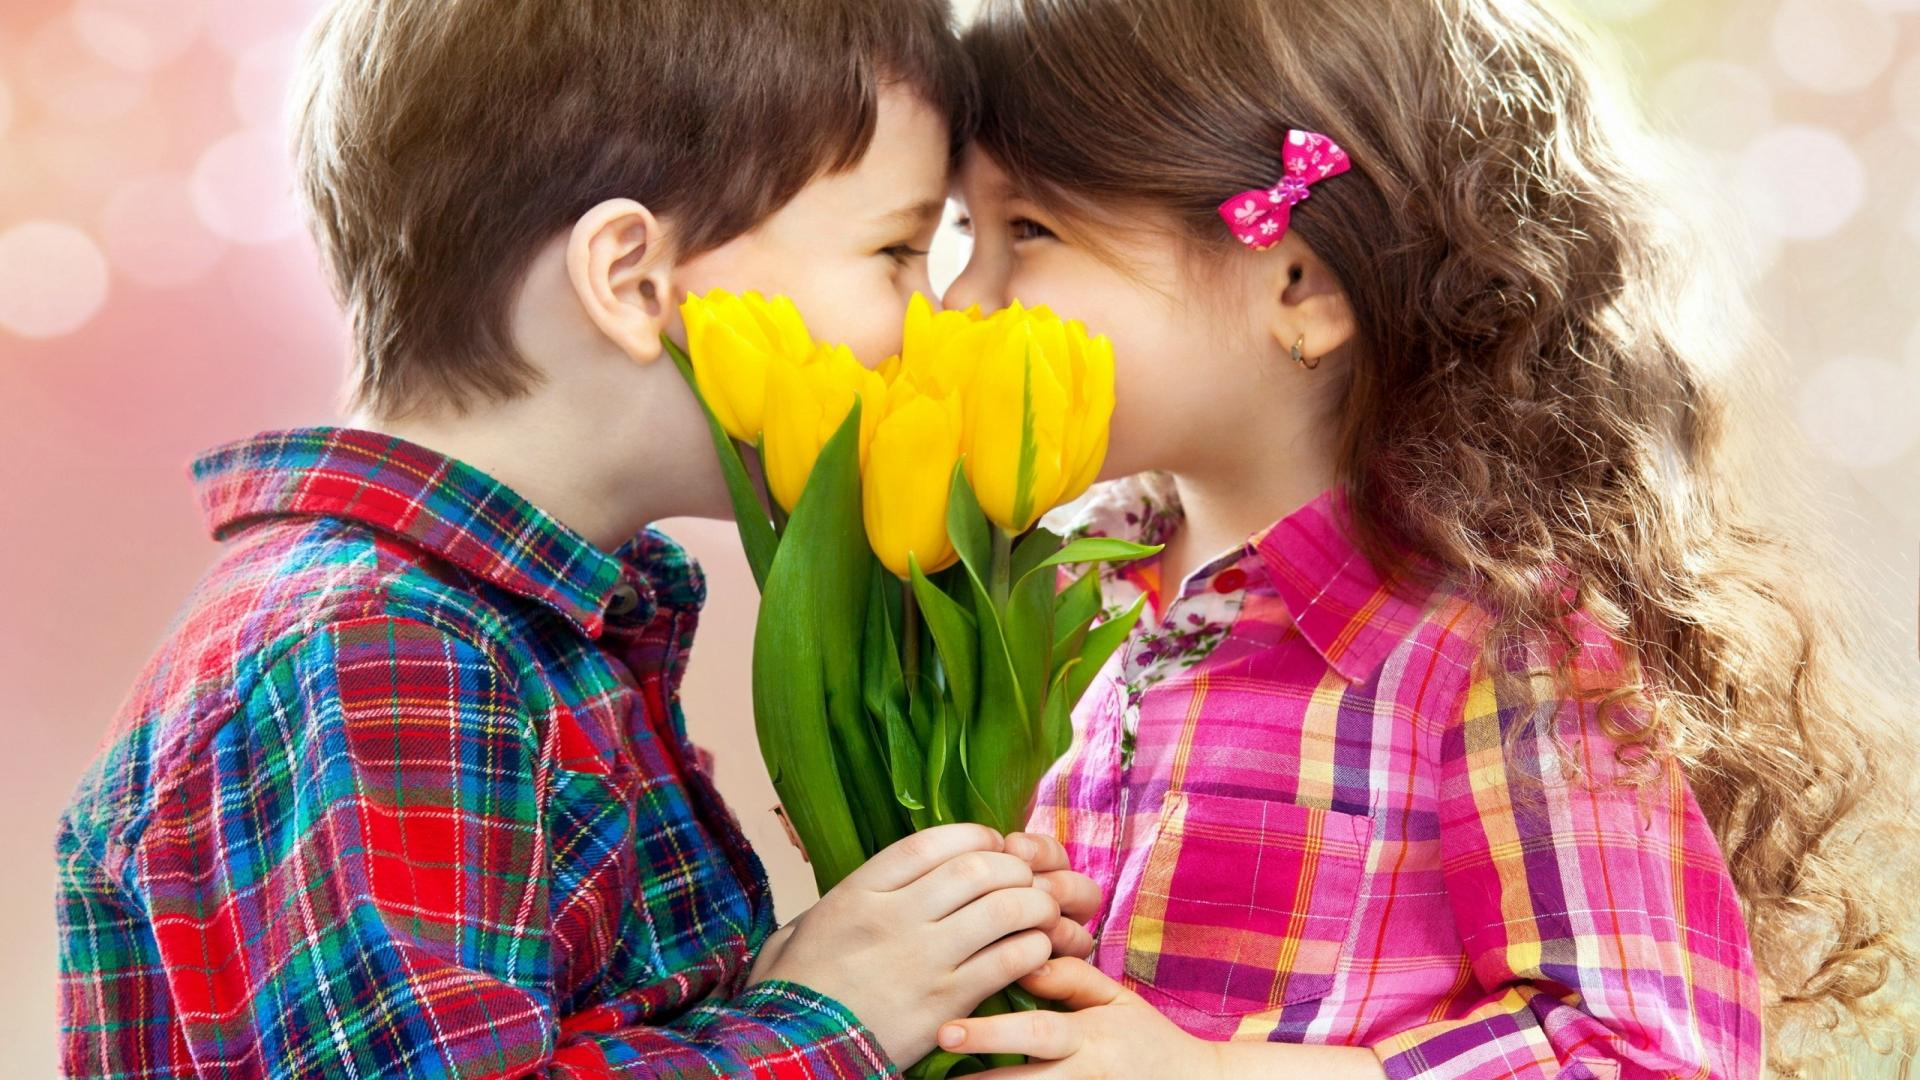 Cute Kids Girl And Boy Kissing HD Wallpaper   Stylish HD Wallpapers 1920x1080